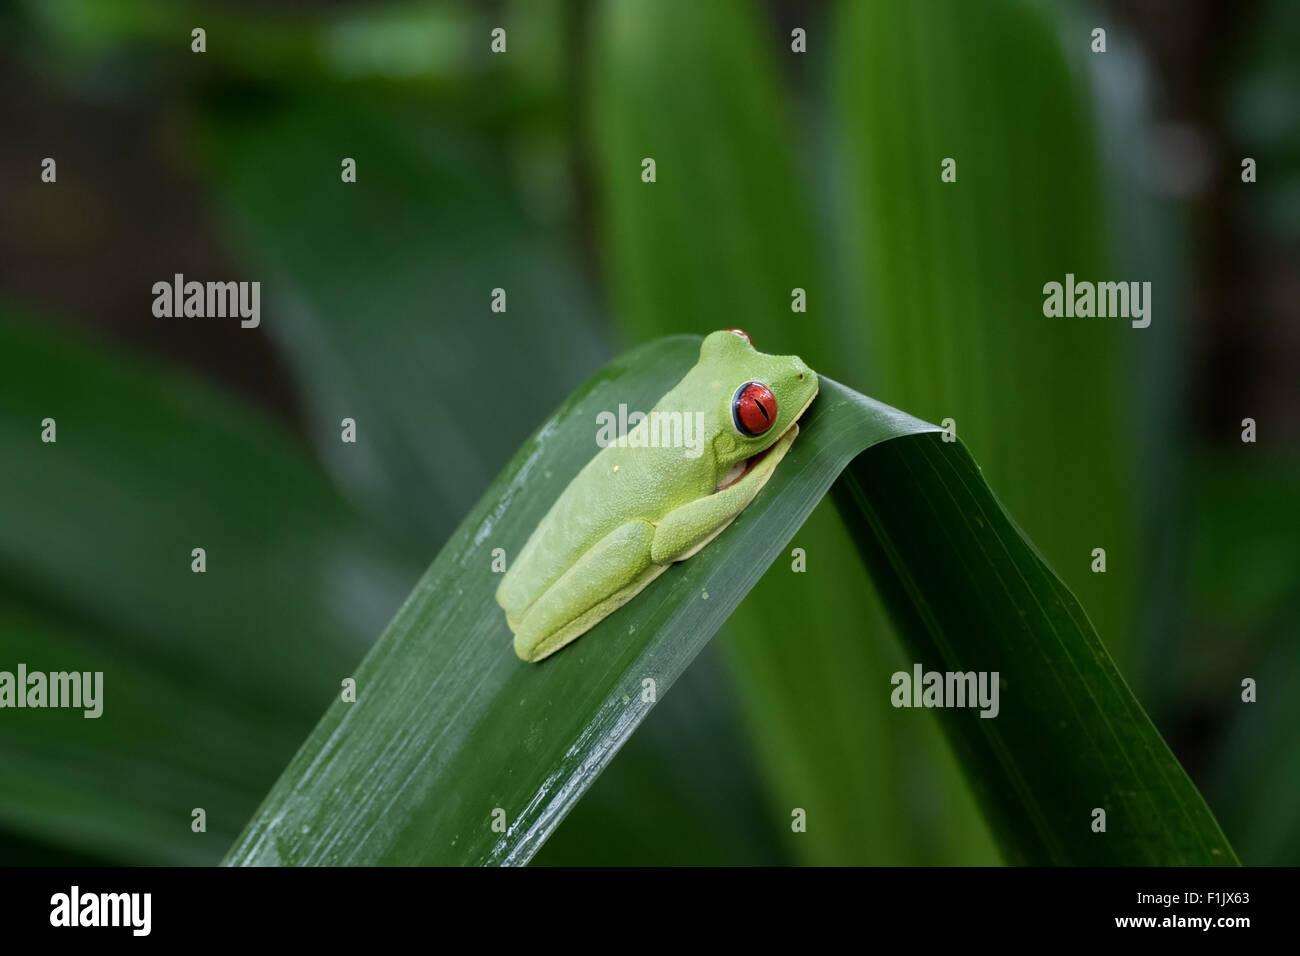 Red-eyed tree frog (Agalychnis callidryas) near Cahuita National Park, Costa Rica. Wild animal, fauna, wildlife, amphibian Stock Photo